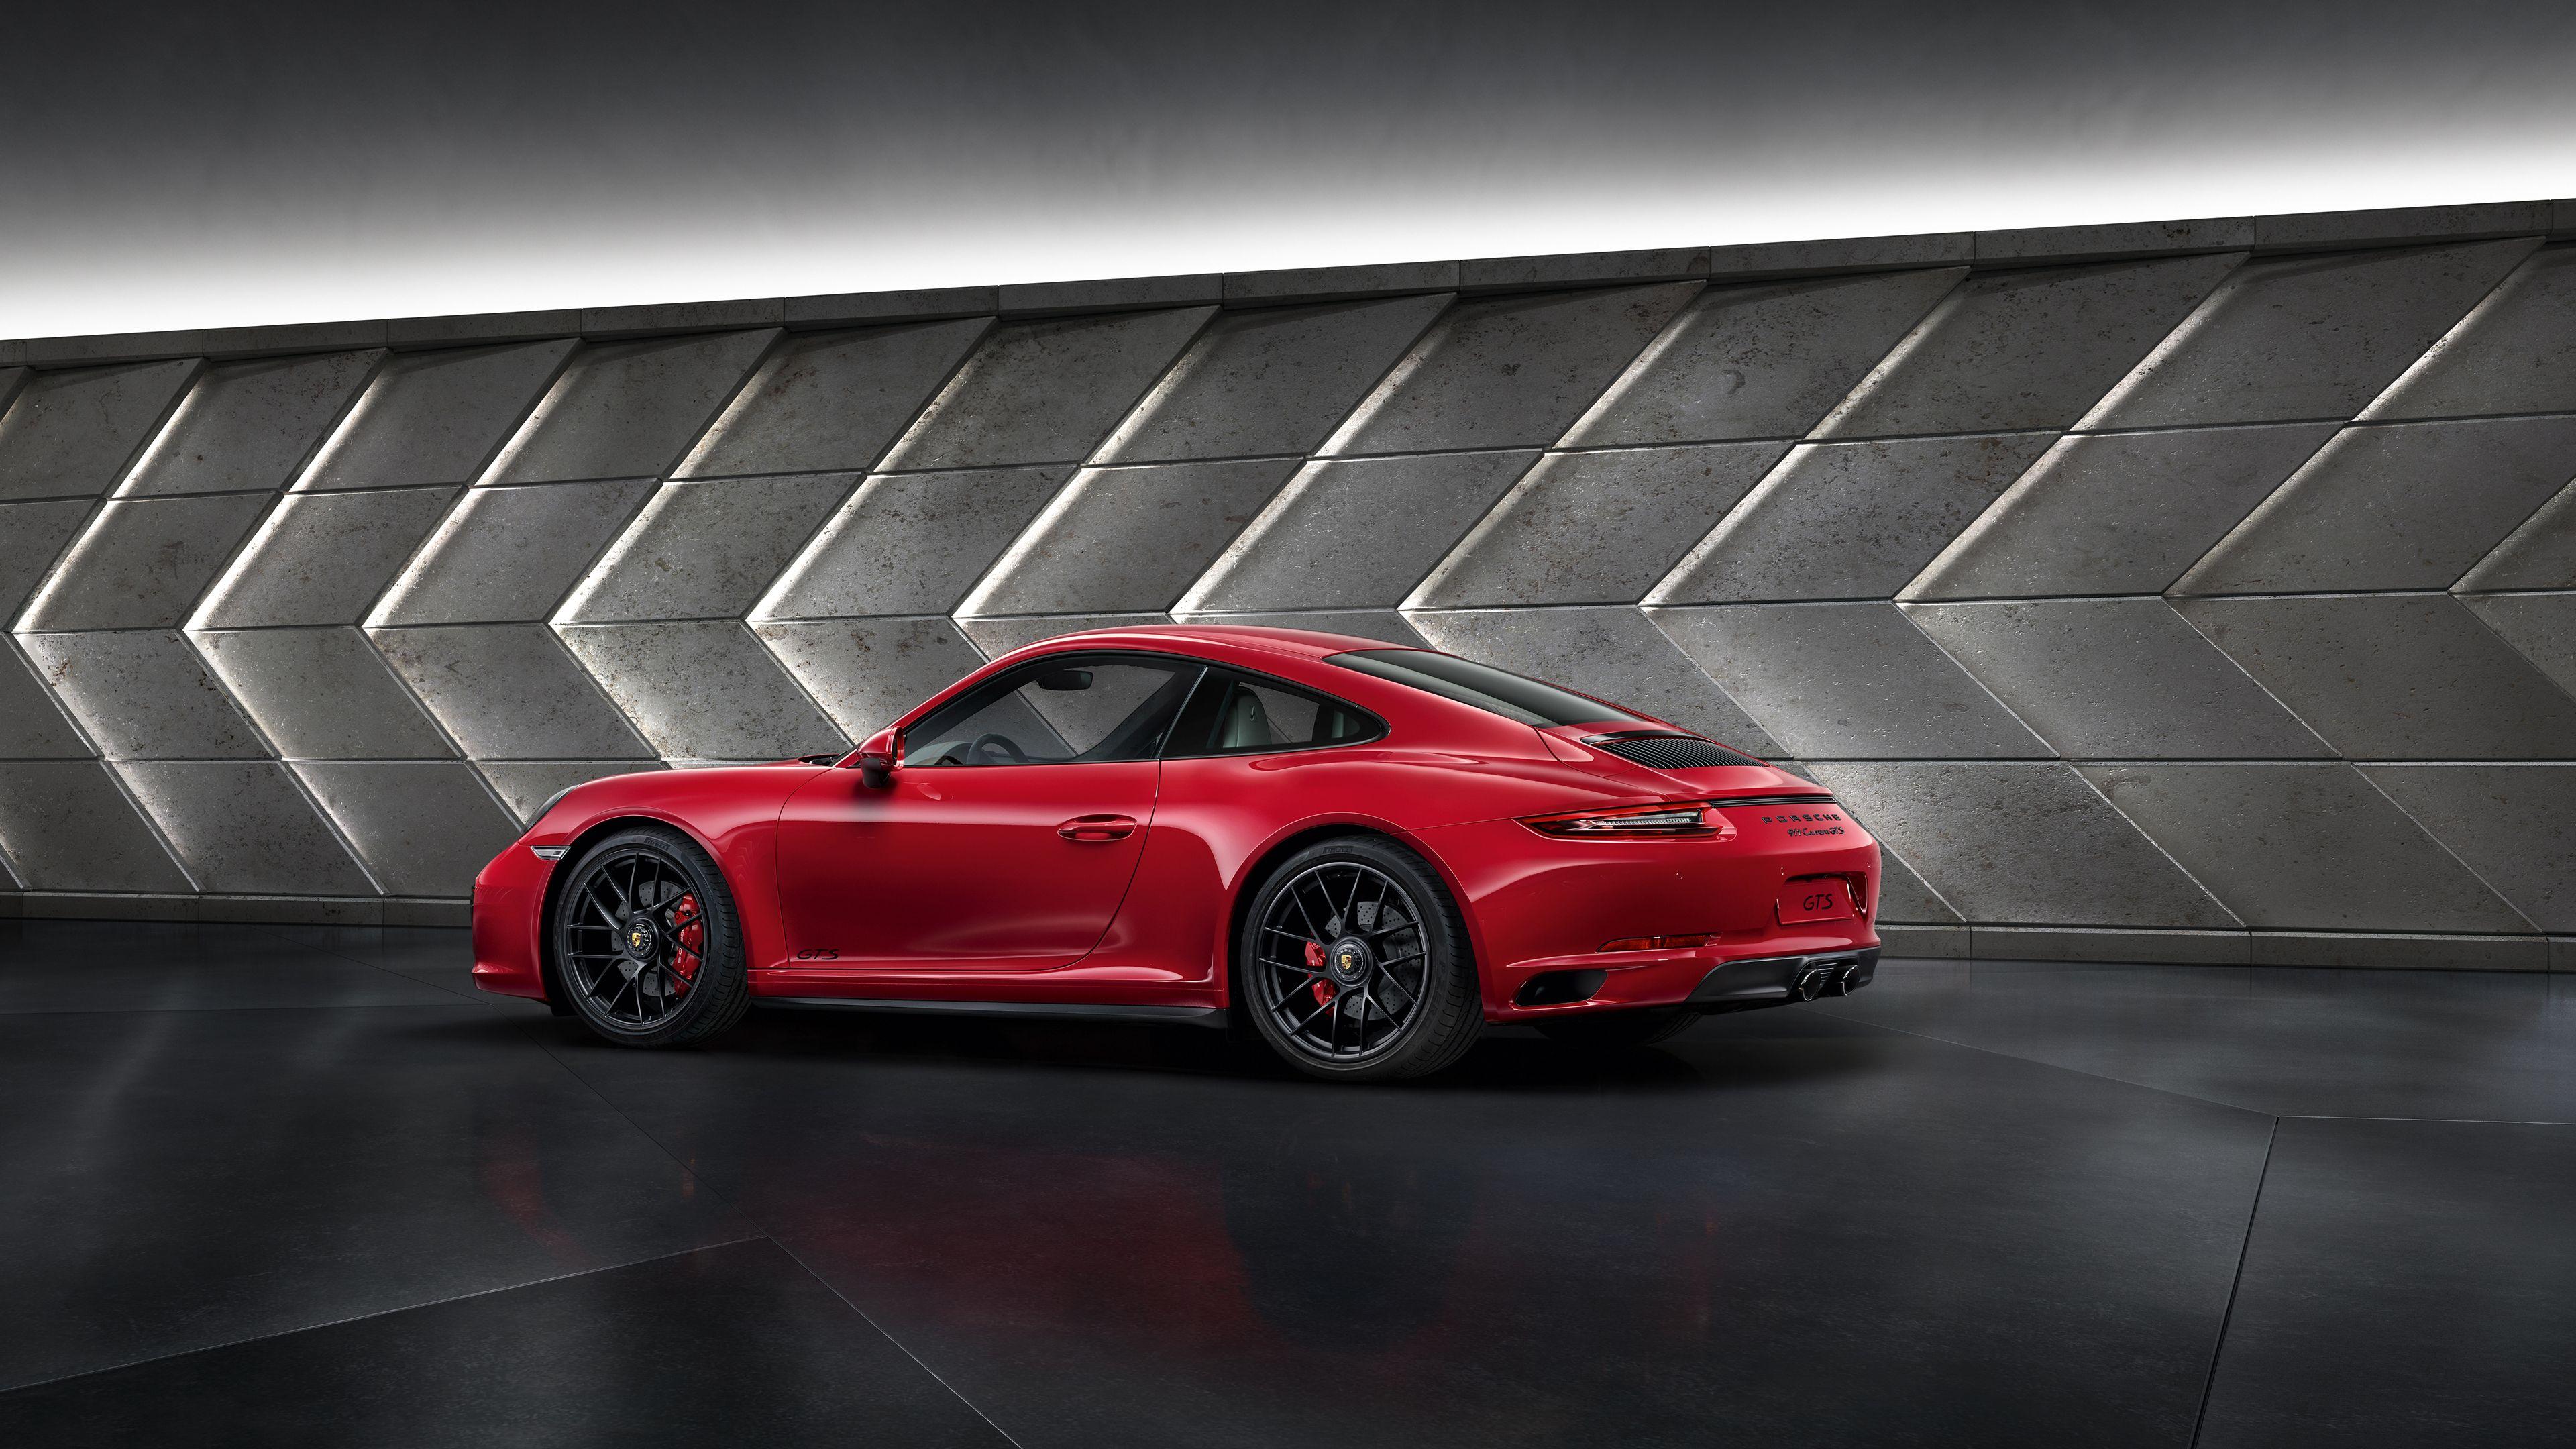 991 Porsche Gts On Behance Porsche Gts Porsche Garage Design Interior Porsche cars hd red behance images